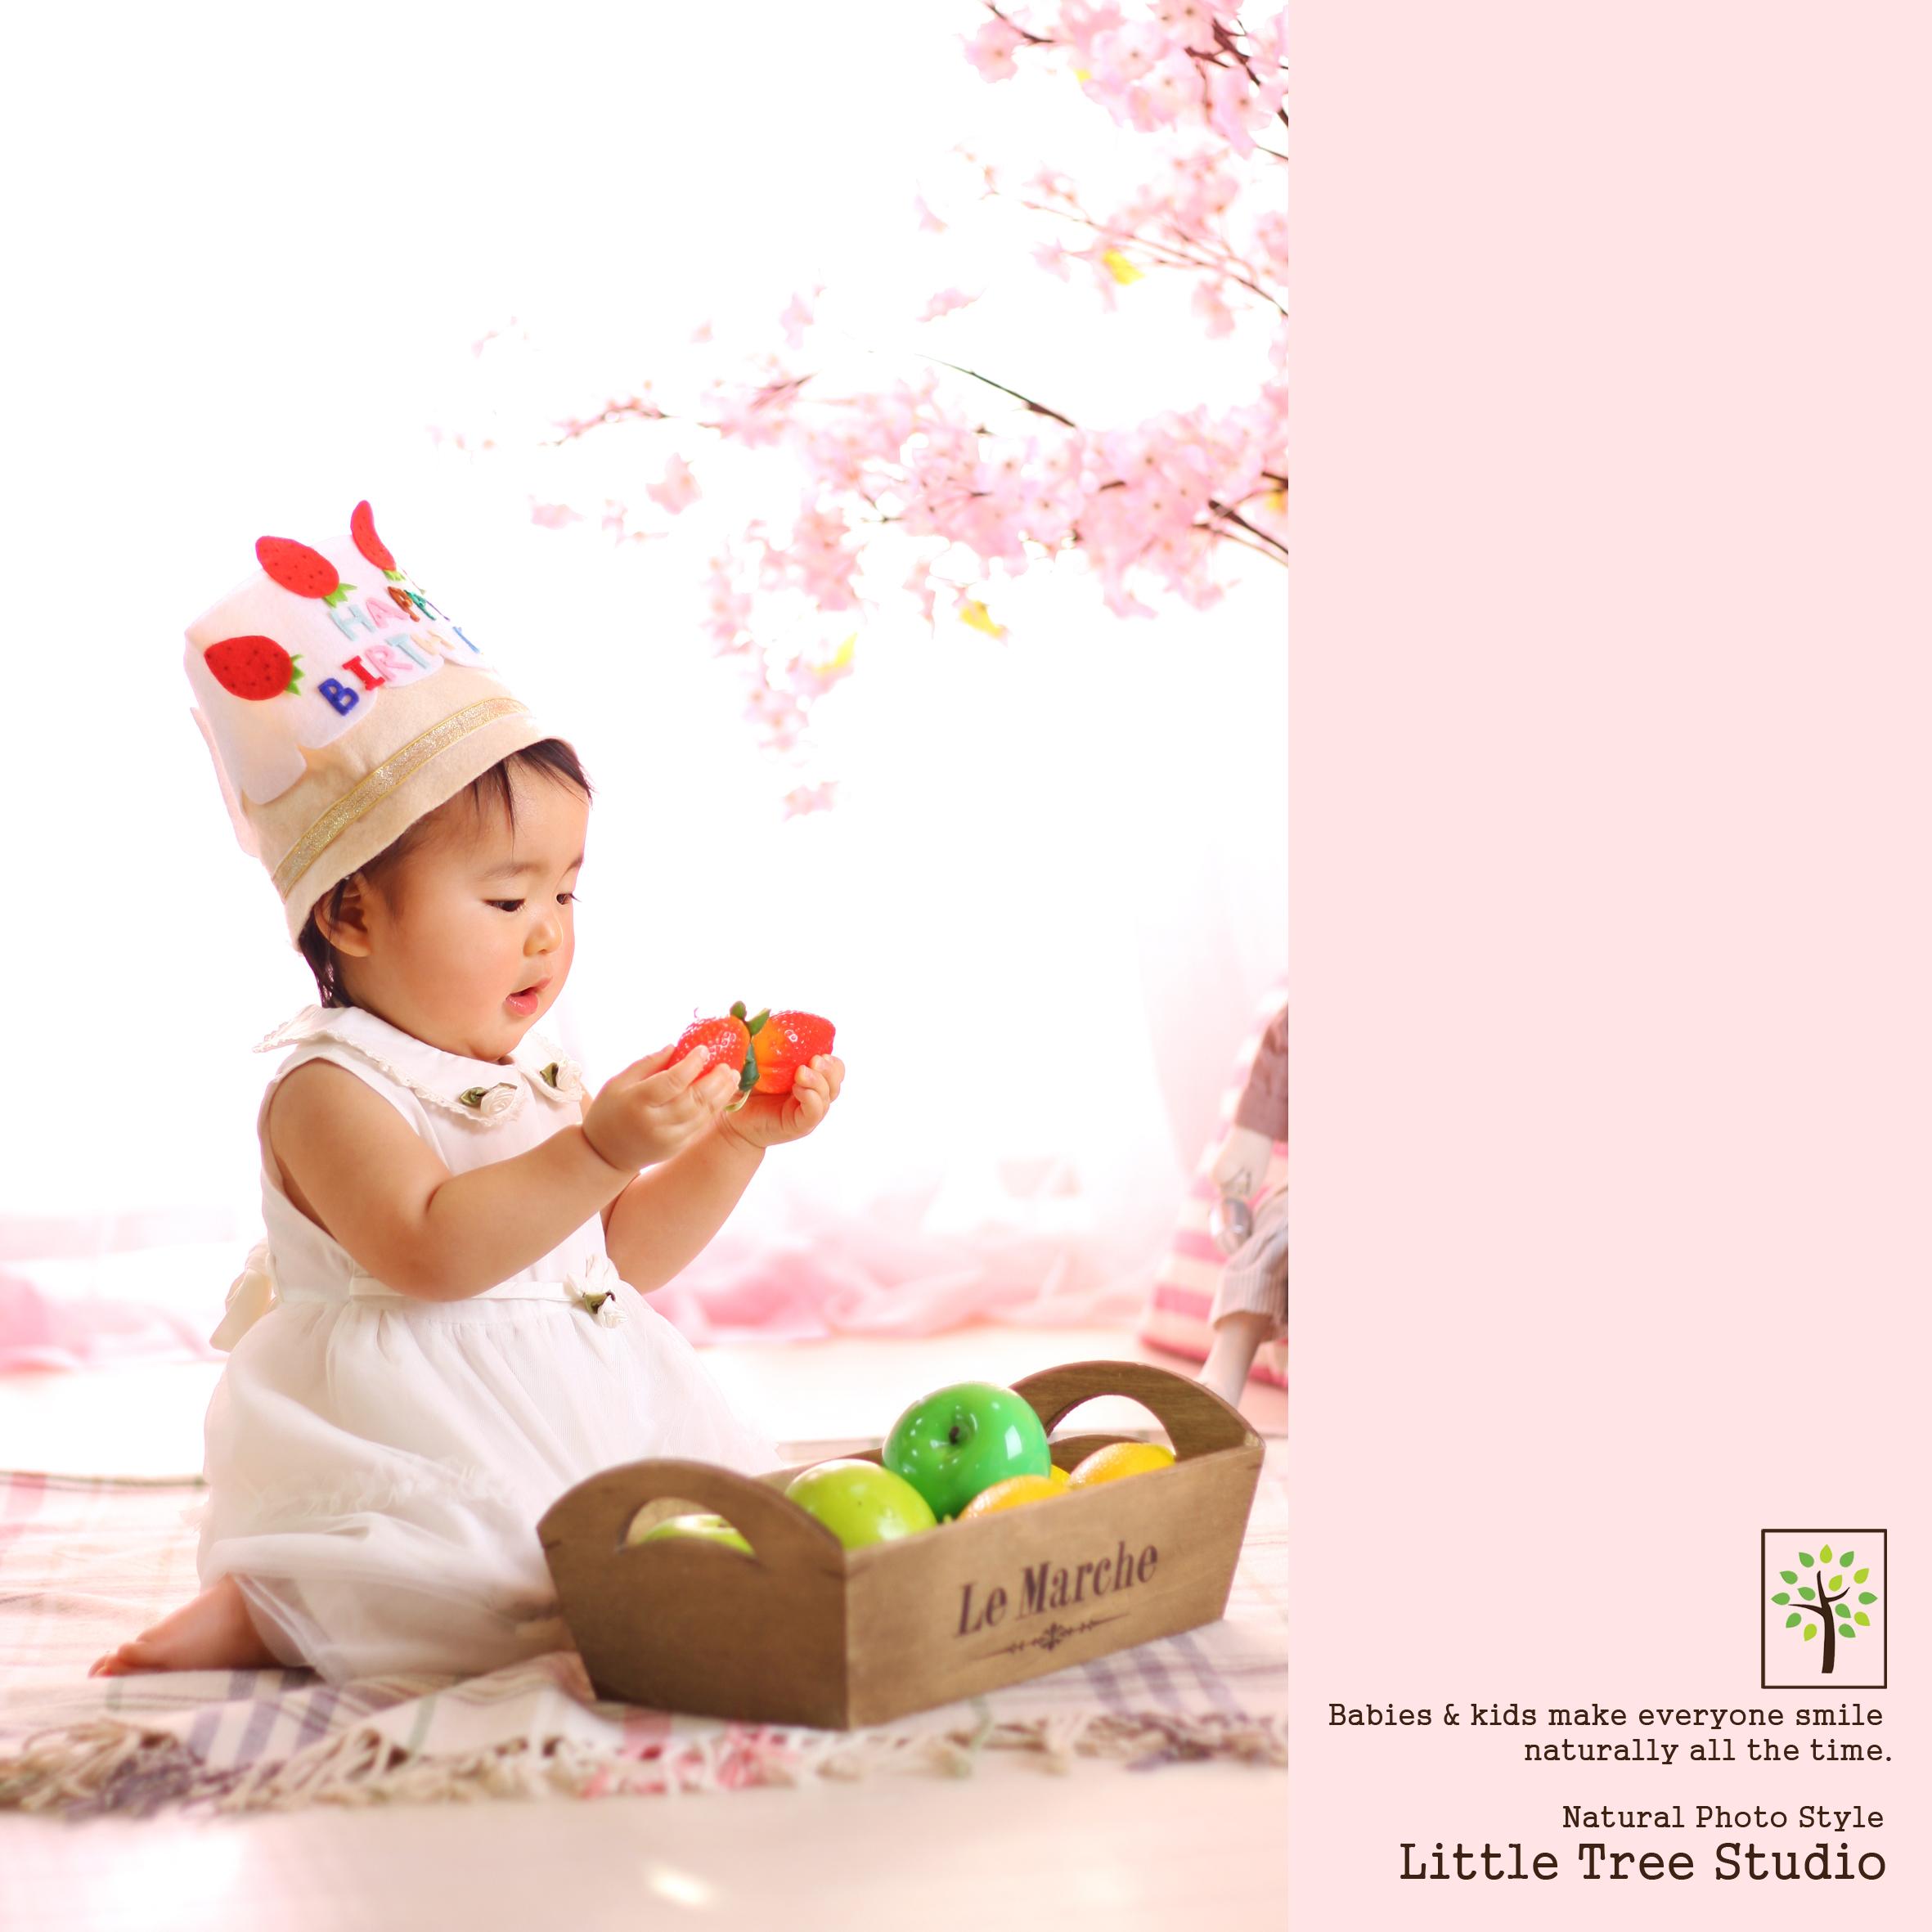 littletree baby128